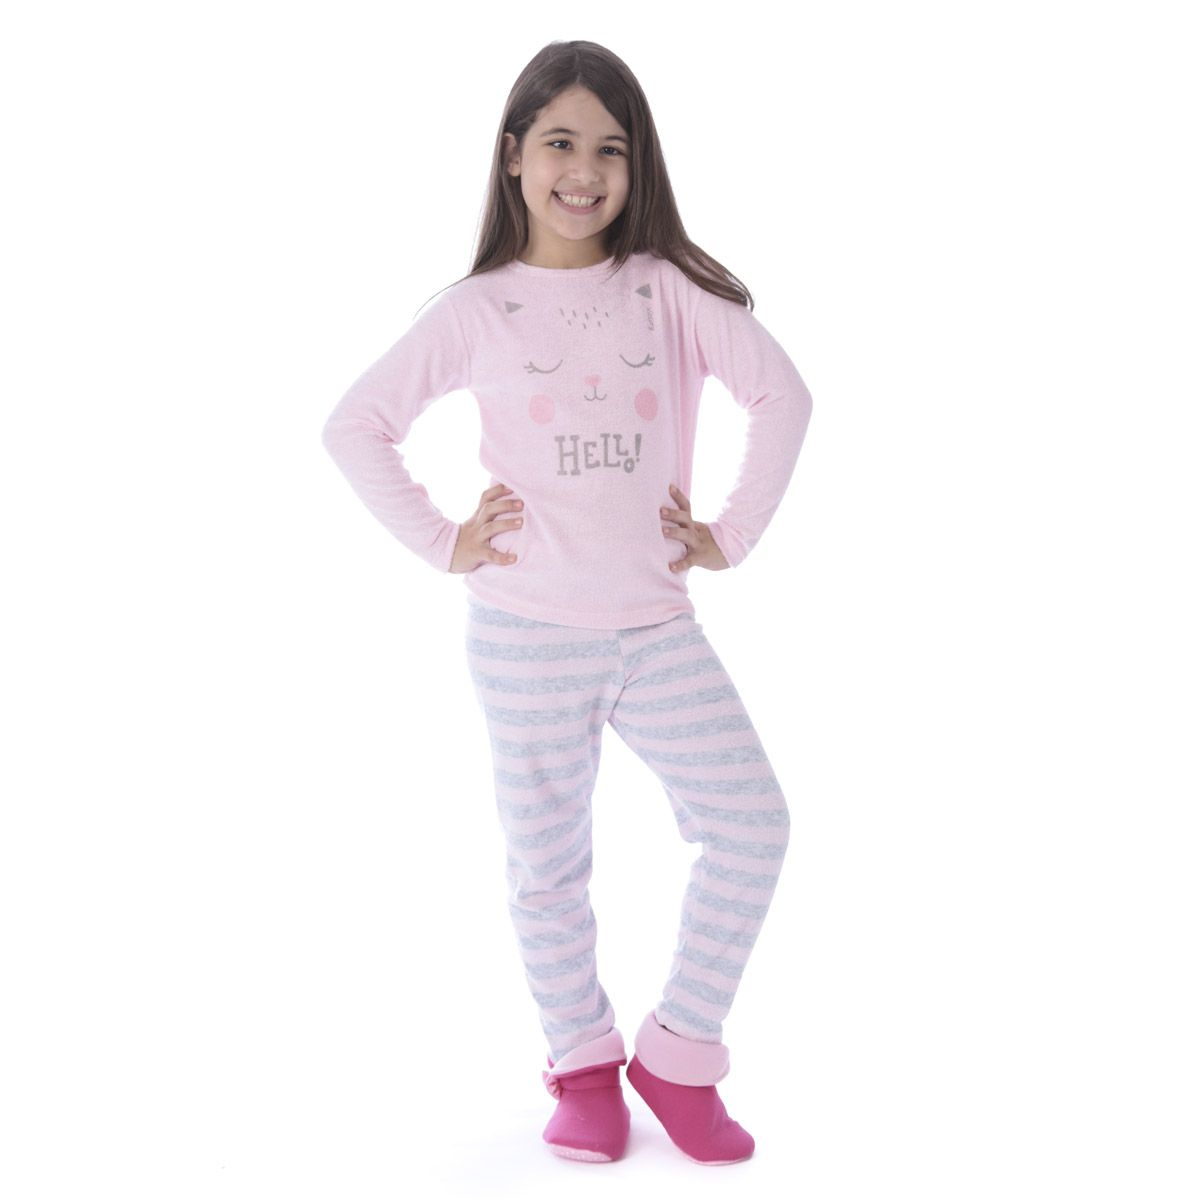 Pijama de inverno infantil para meninas LISTRADO Victory